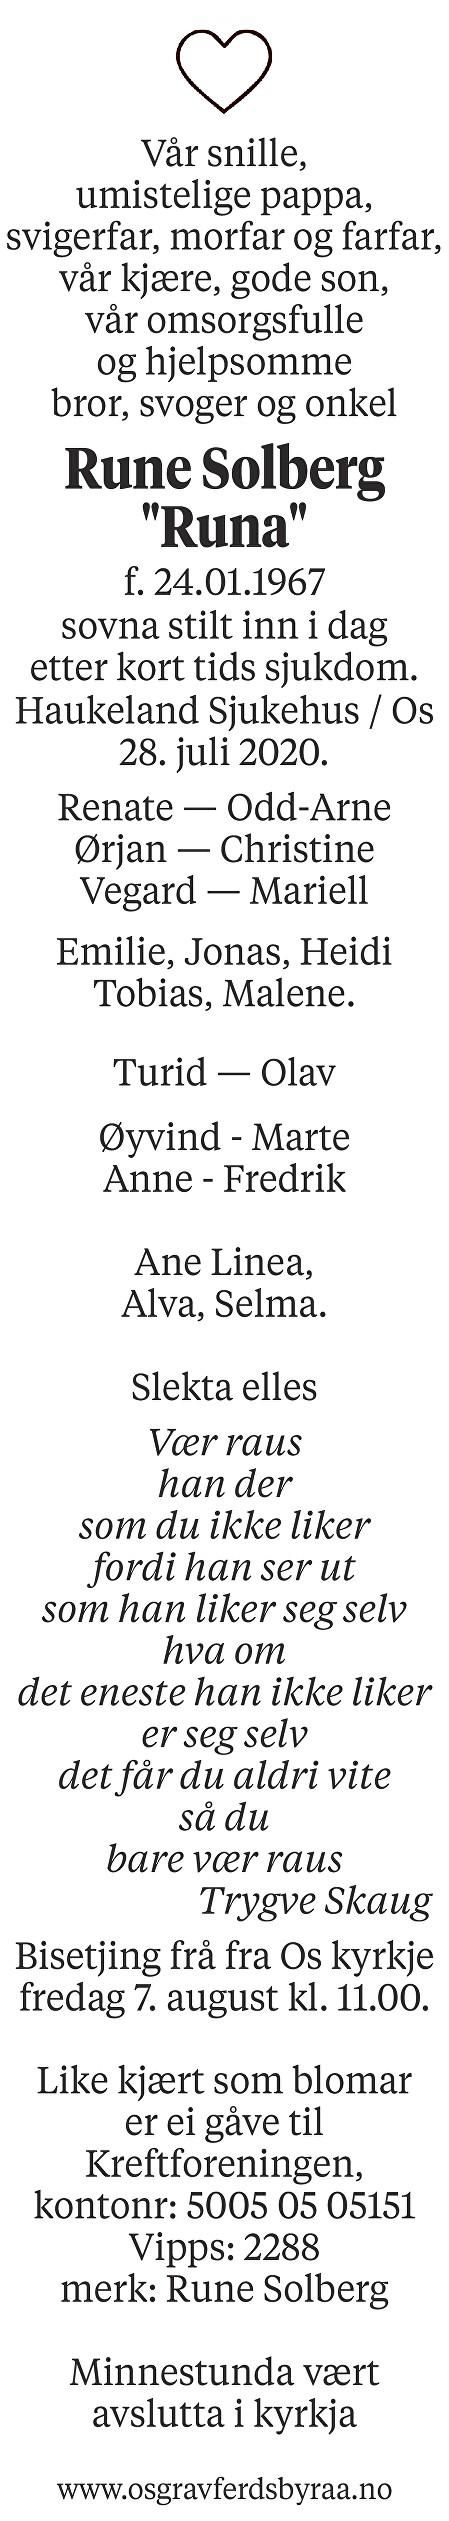 Rune Solberg Dødsannonse